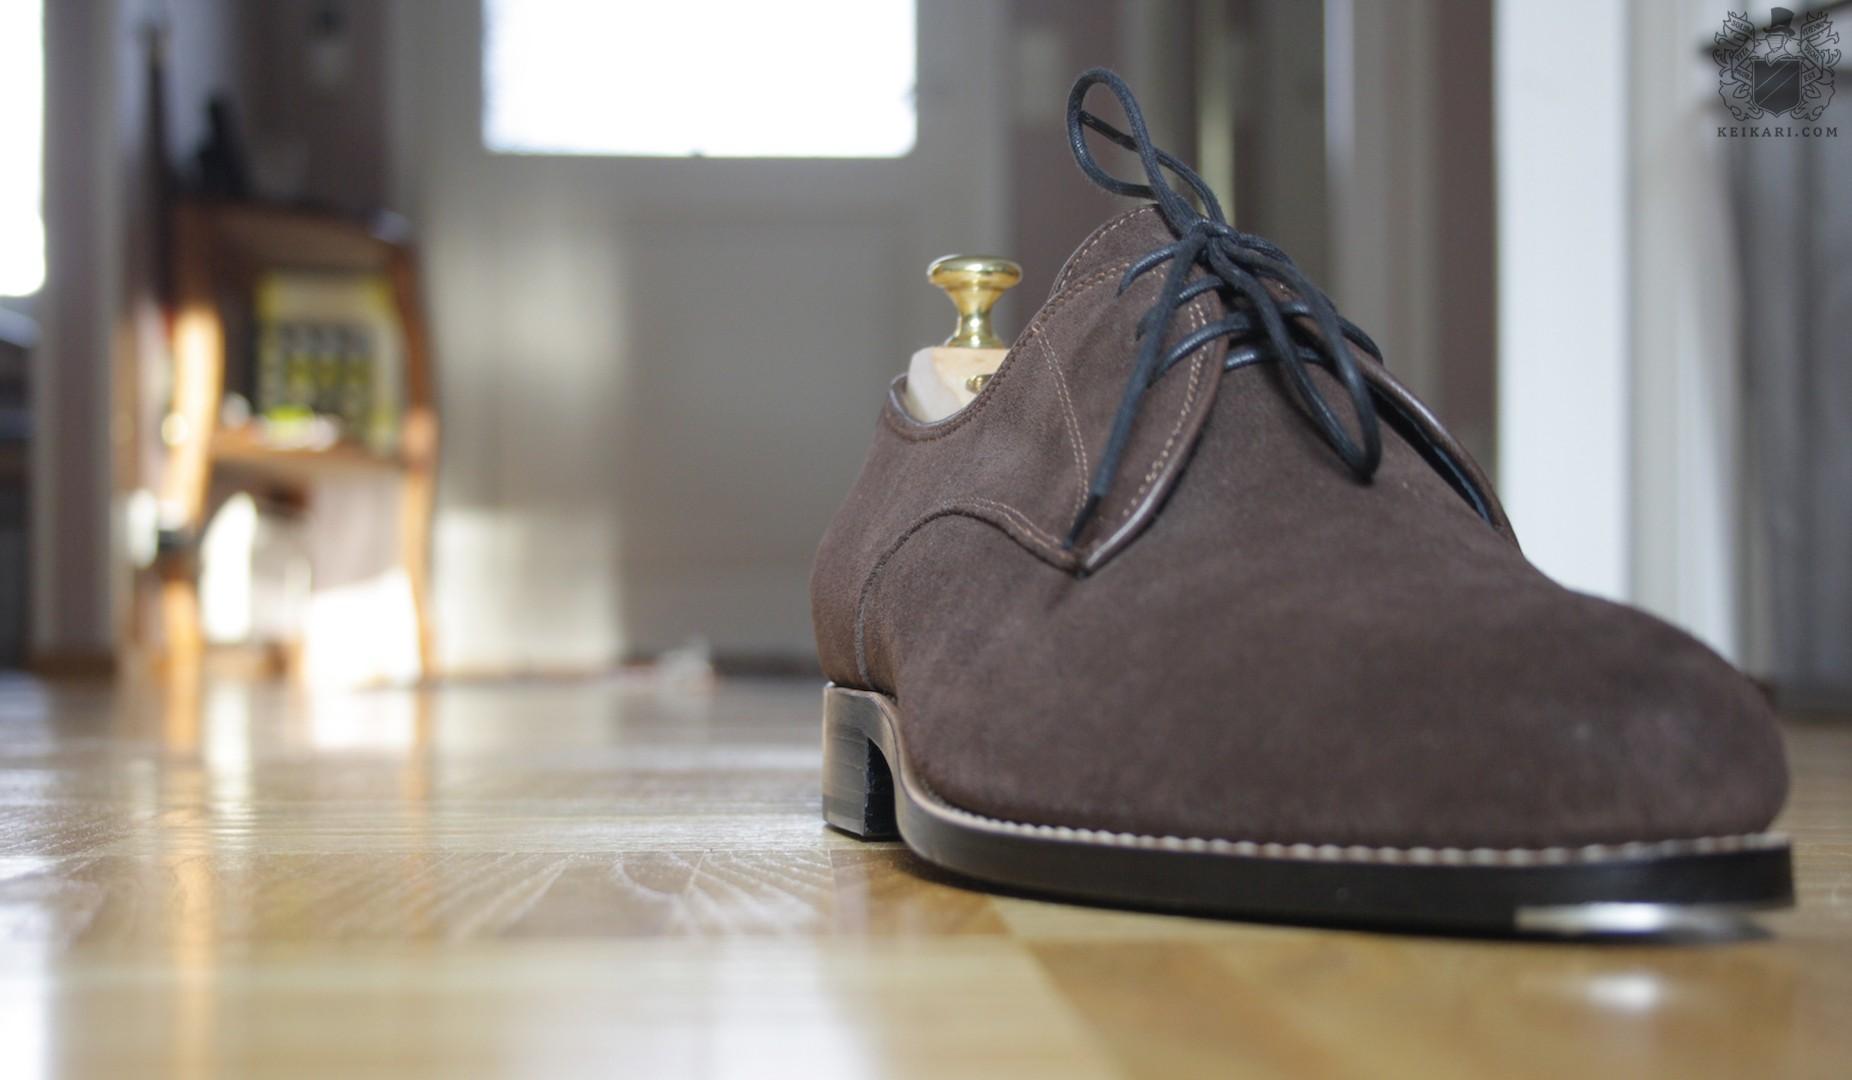 Anatomy_of_Buday_shoes_at_Keikari_dot_com10.jpg